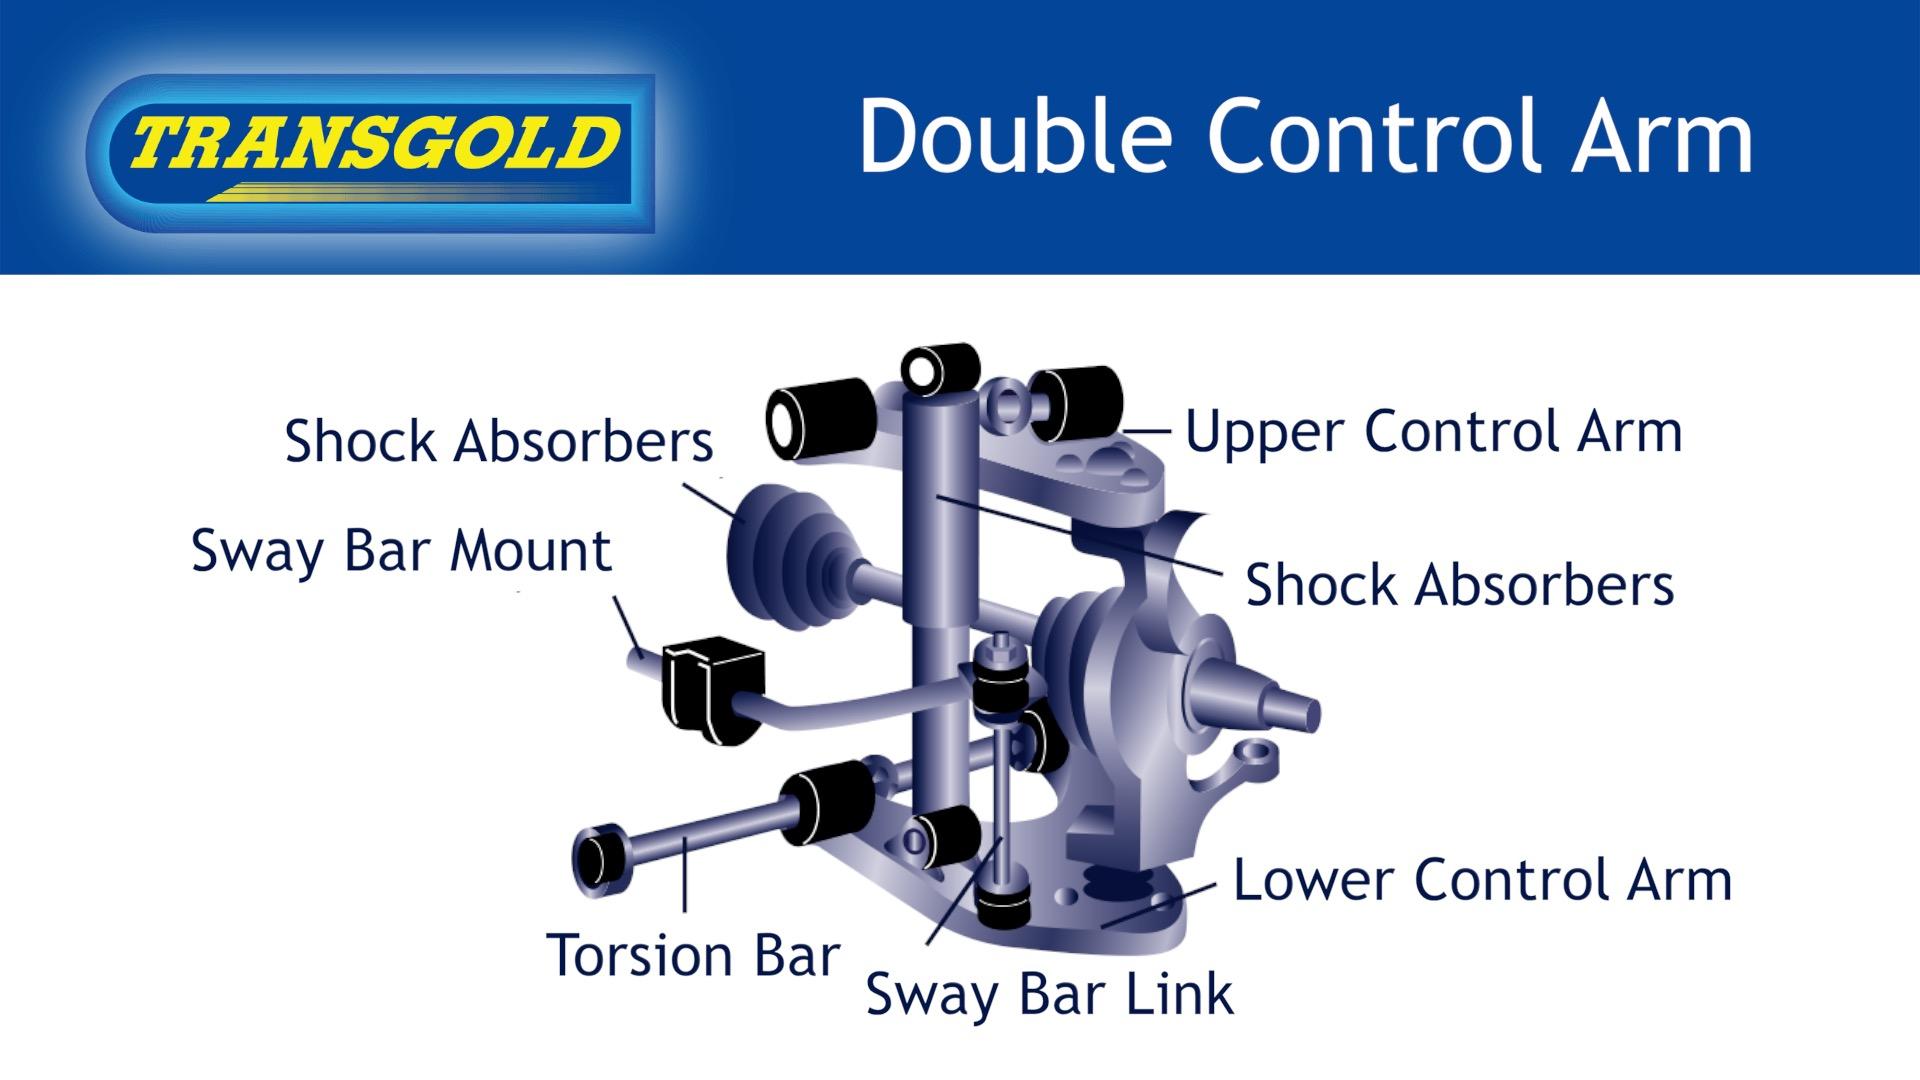 Double Control Arm